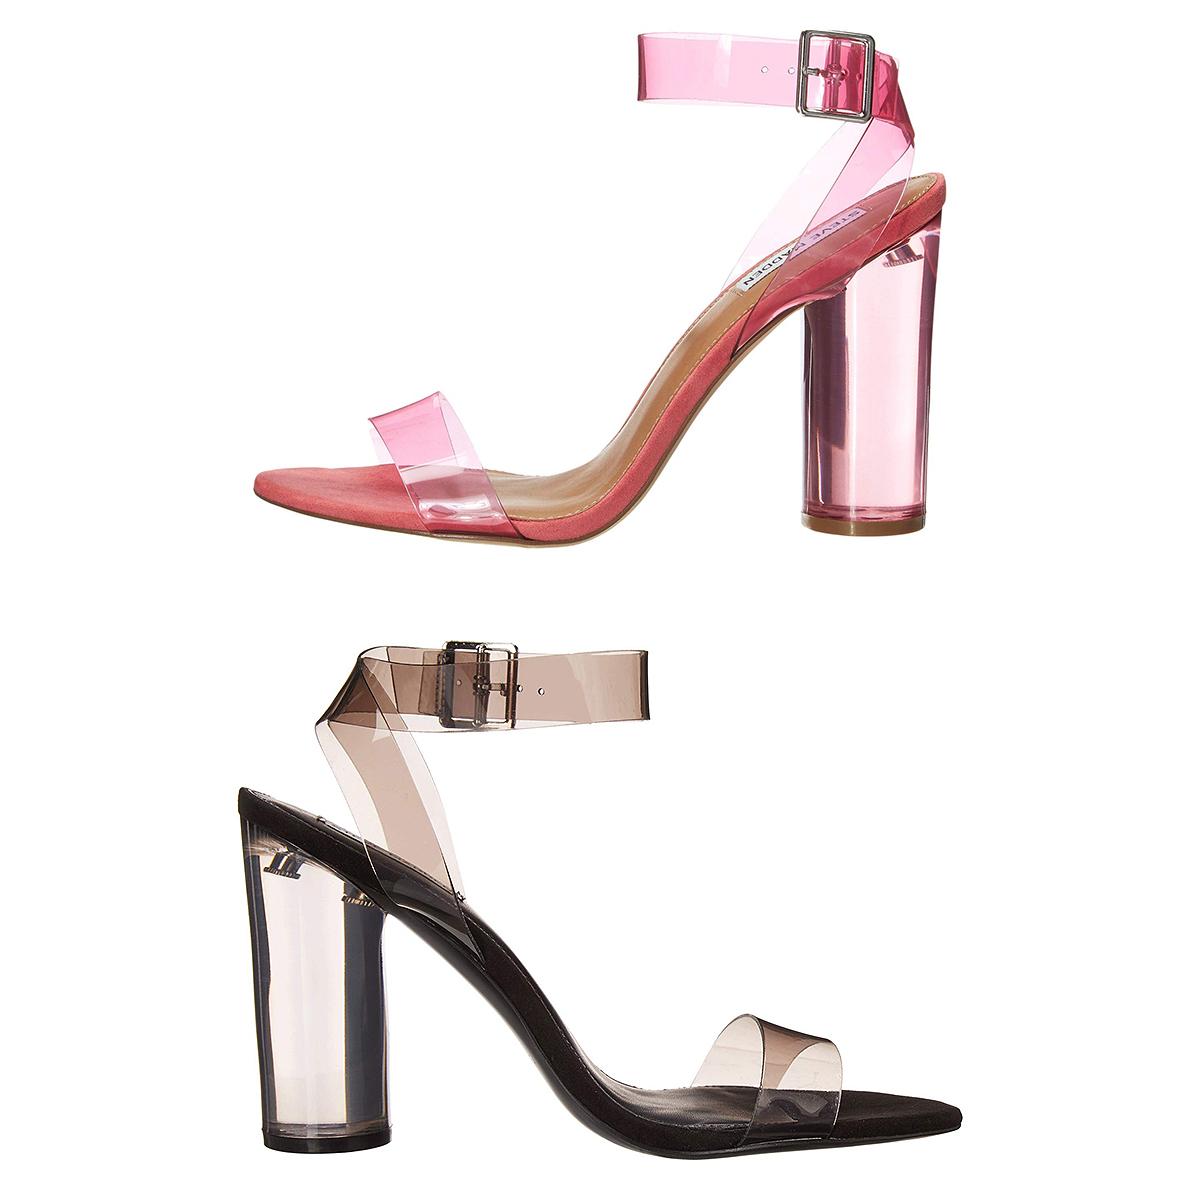 Steve Madden Clearer heels